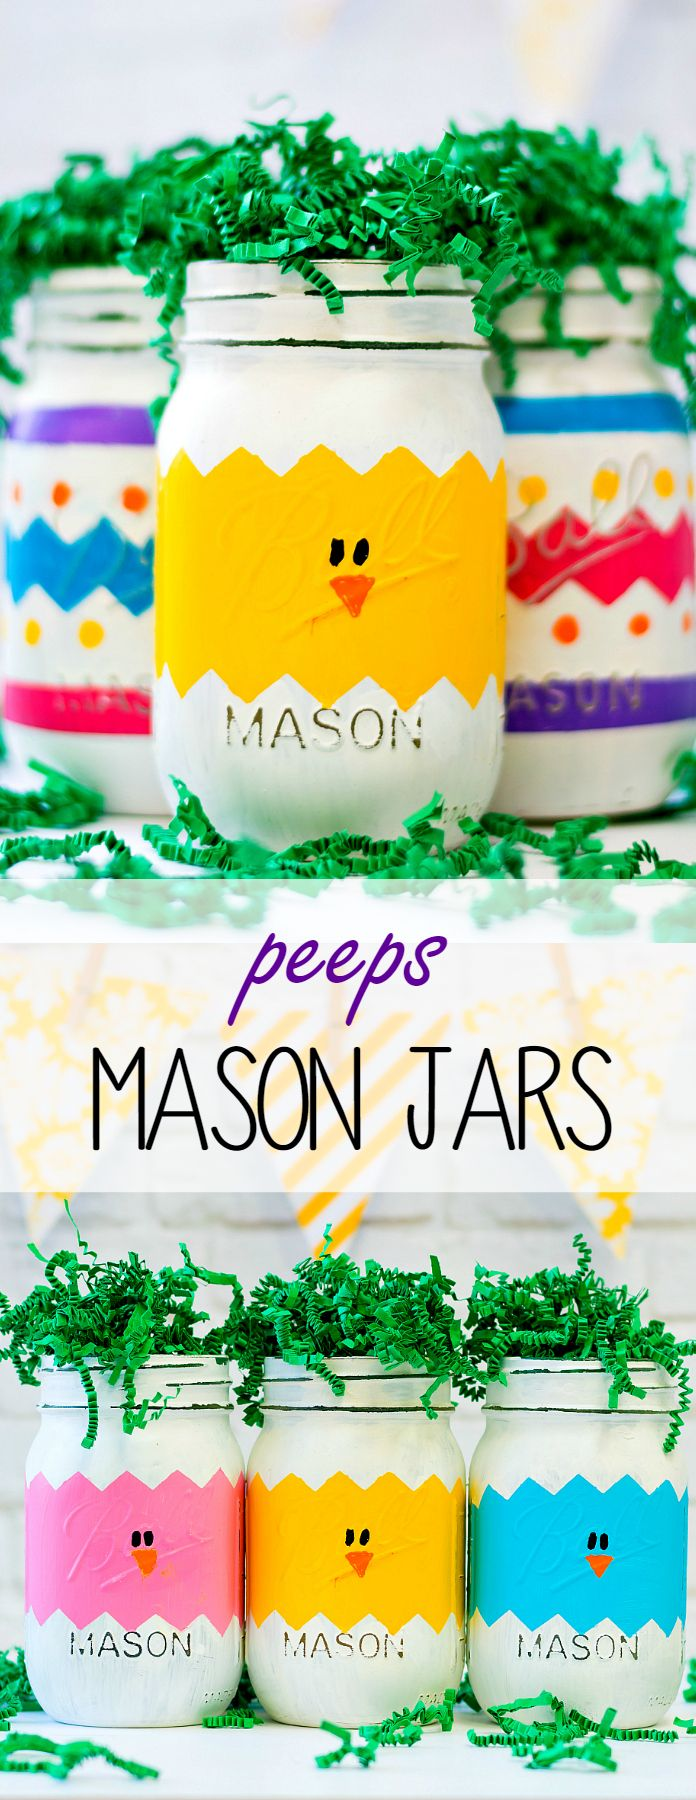 Peeps Mason Jars For Easter   Mason Jar Crafts Love